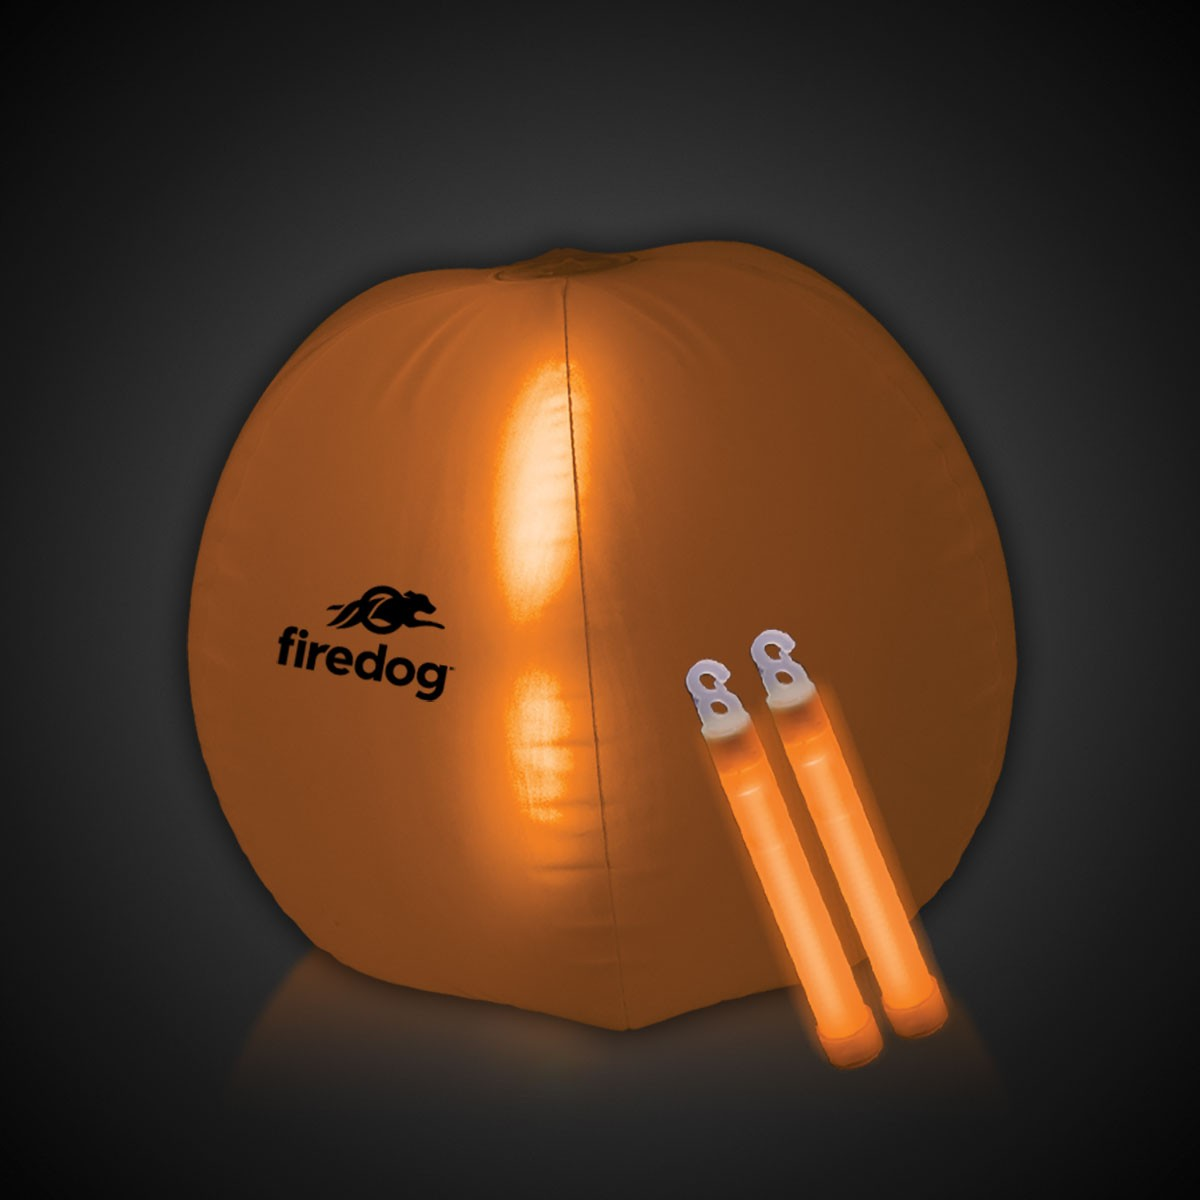 24 Inch Inflatable Beach Ball with 2 - 6 Inch ORANGE Glow Sticks